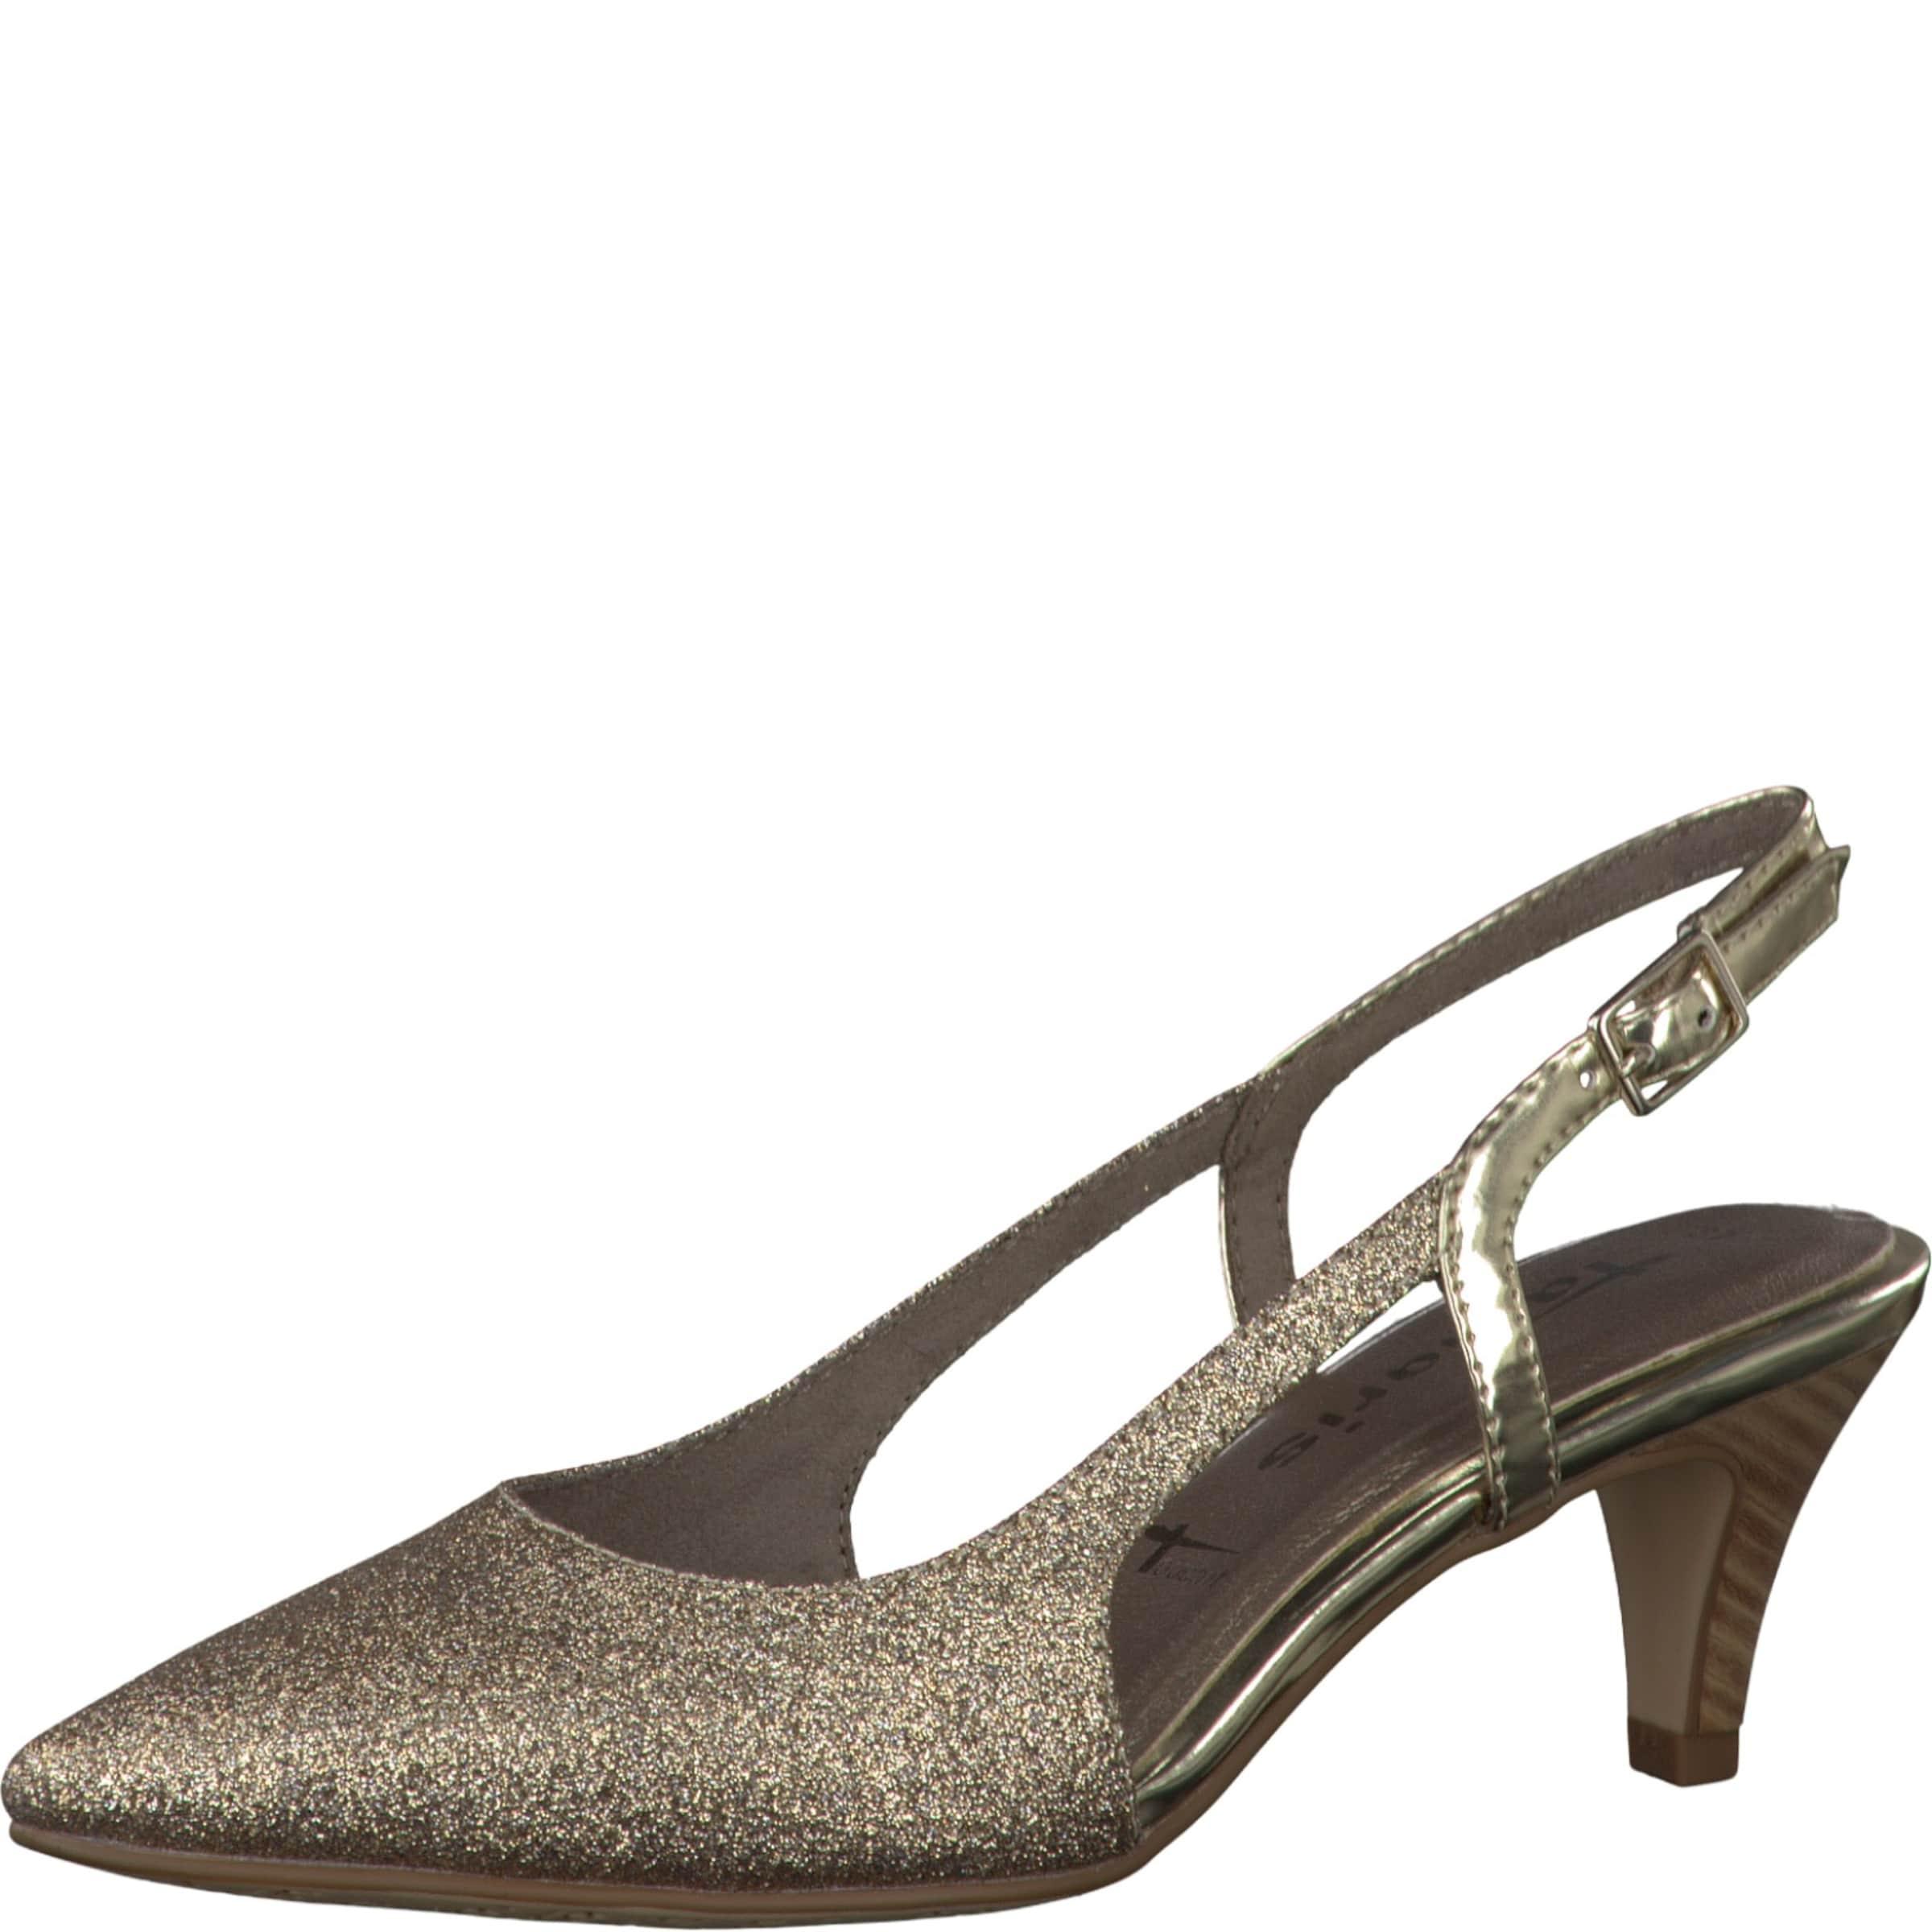 TAMARIS Slingpumps Verschleißfeste billige Schuhe Hohe Qualität